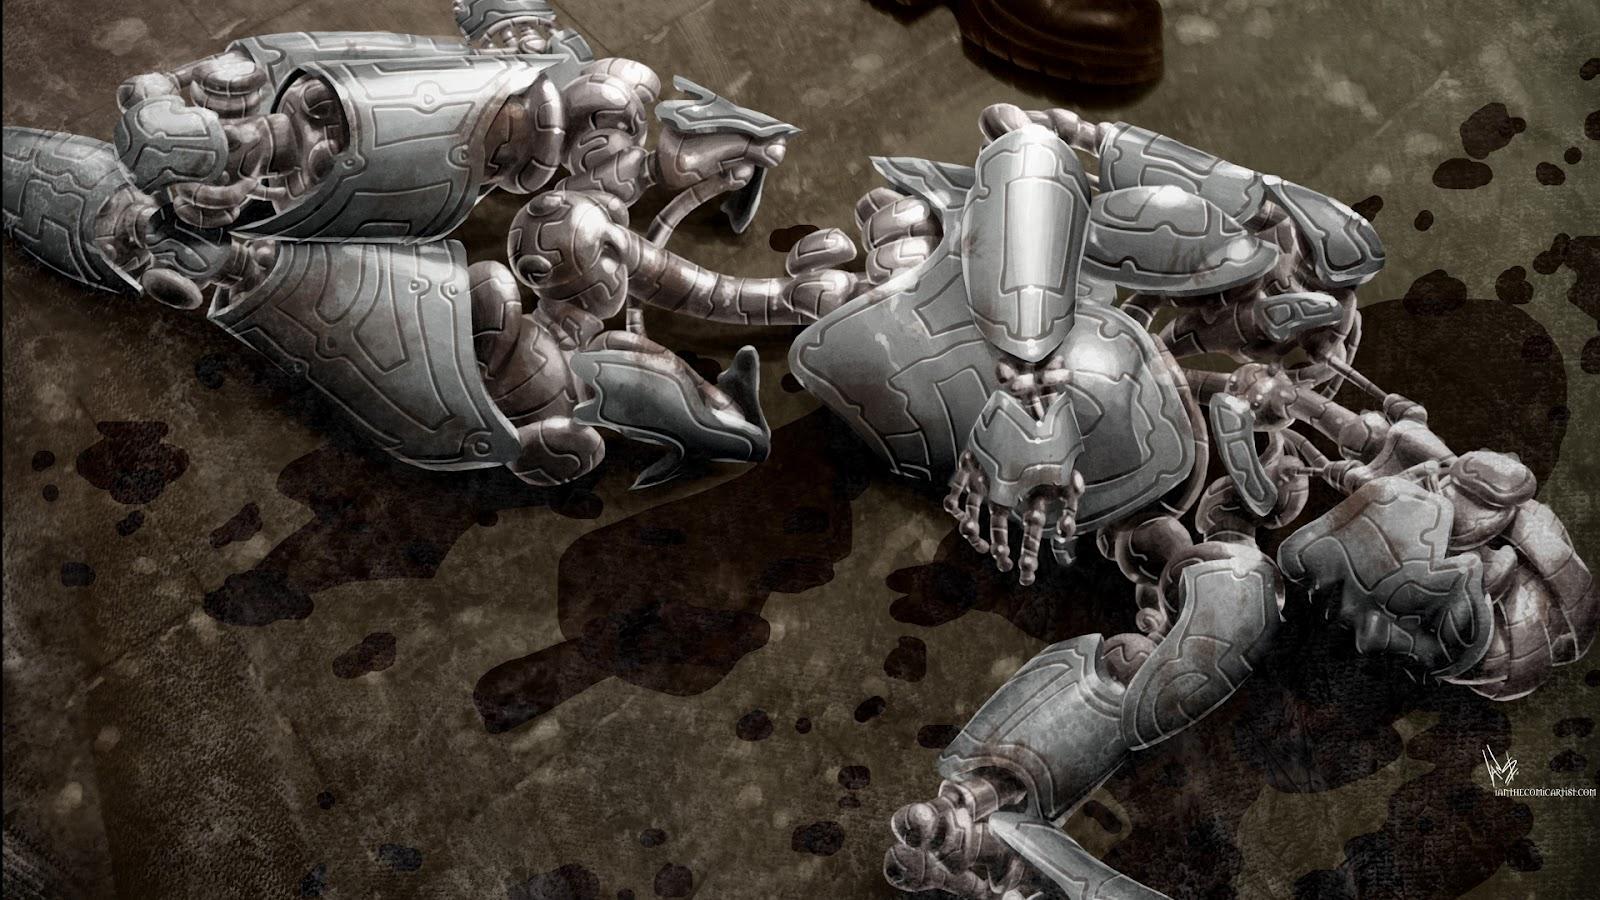 Cyberpunk Wallpaper 1600x900